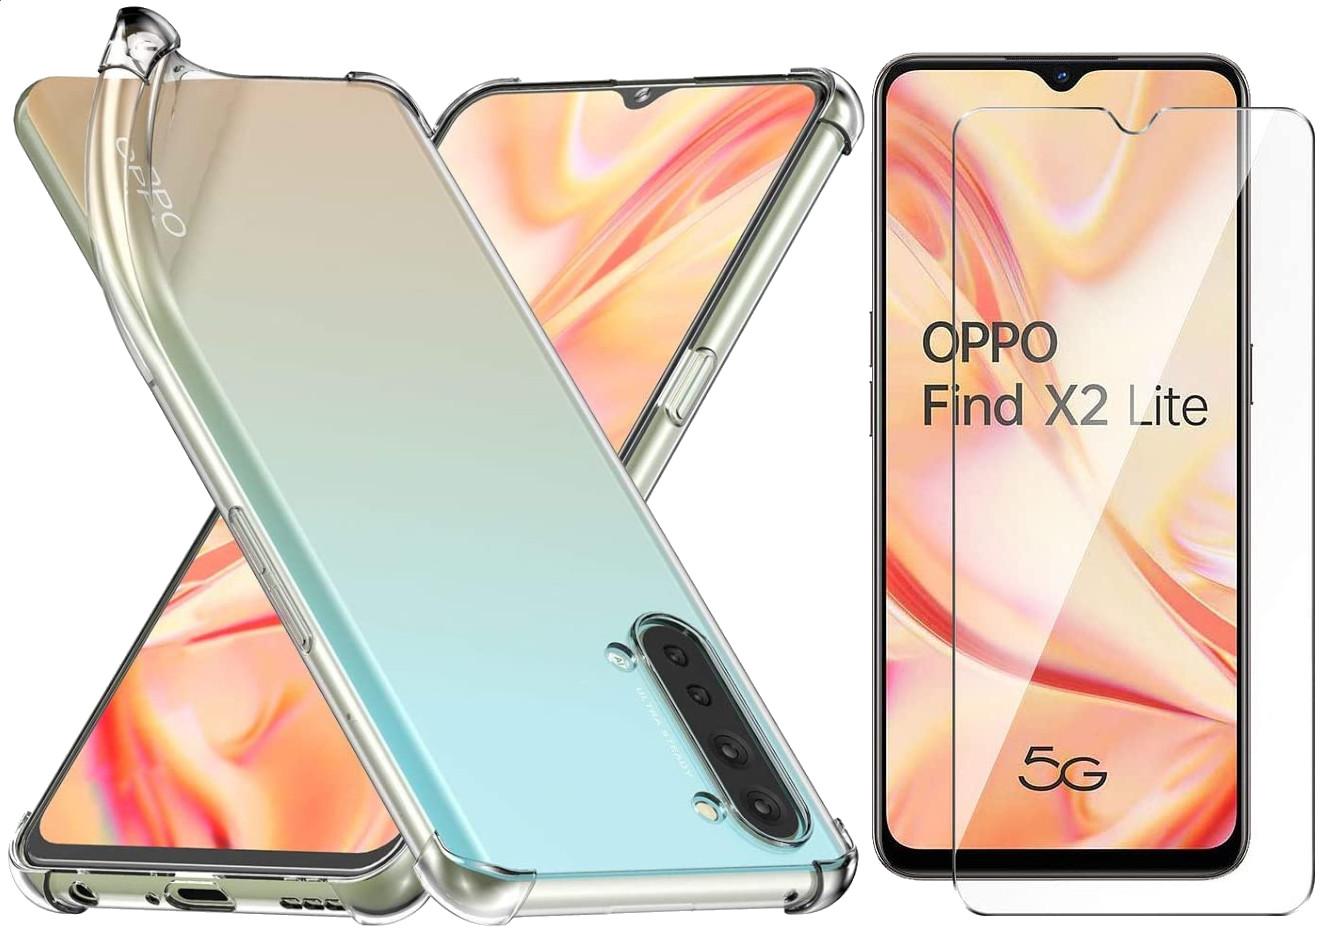 Coque Silicone TPU Transparente Angles Renforces + Verre Trempe Pour Oppo Find X2 Lite Little Boutik®